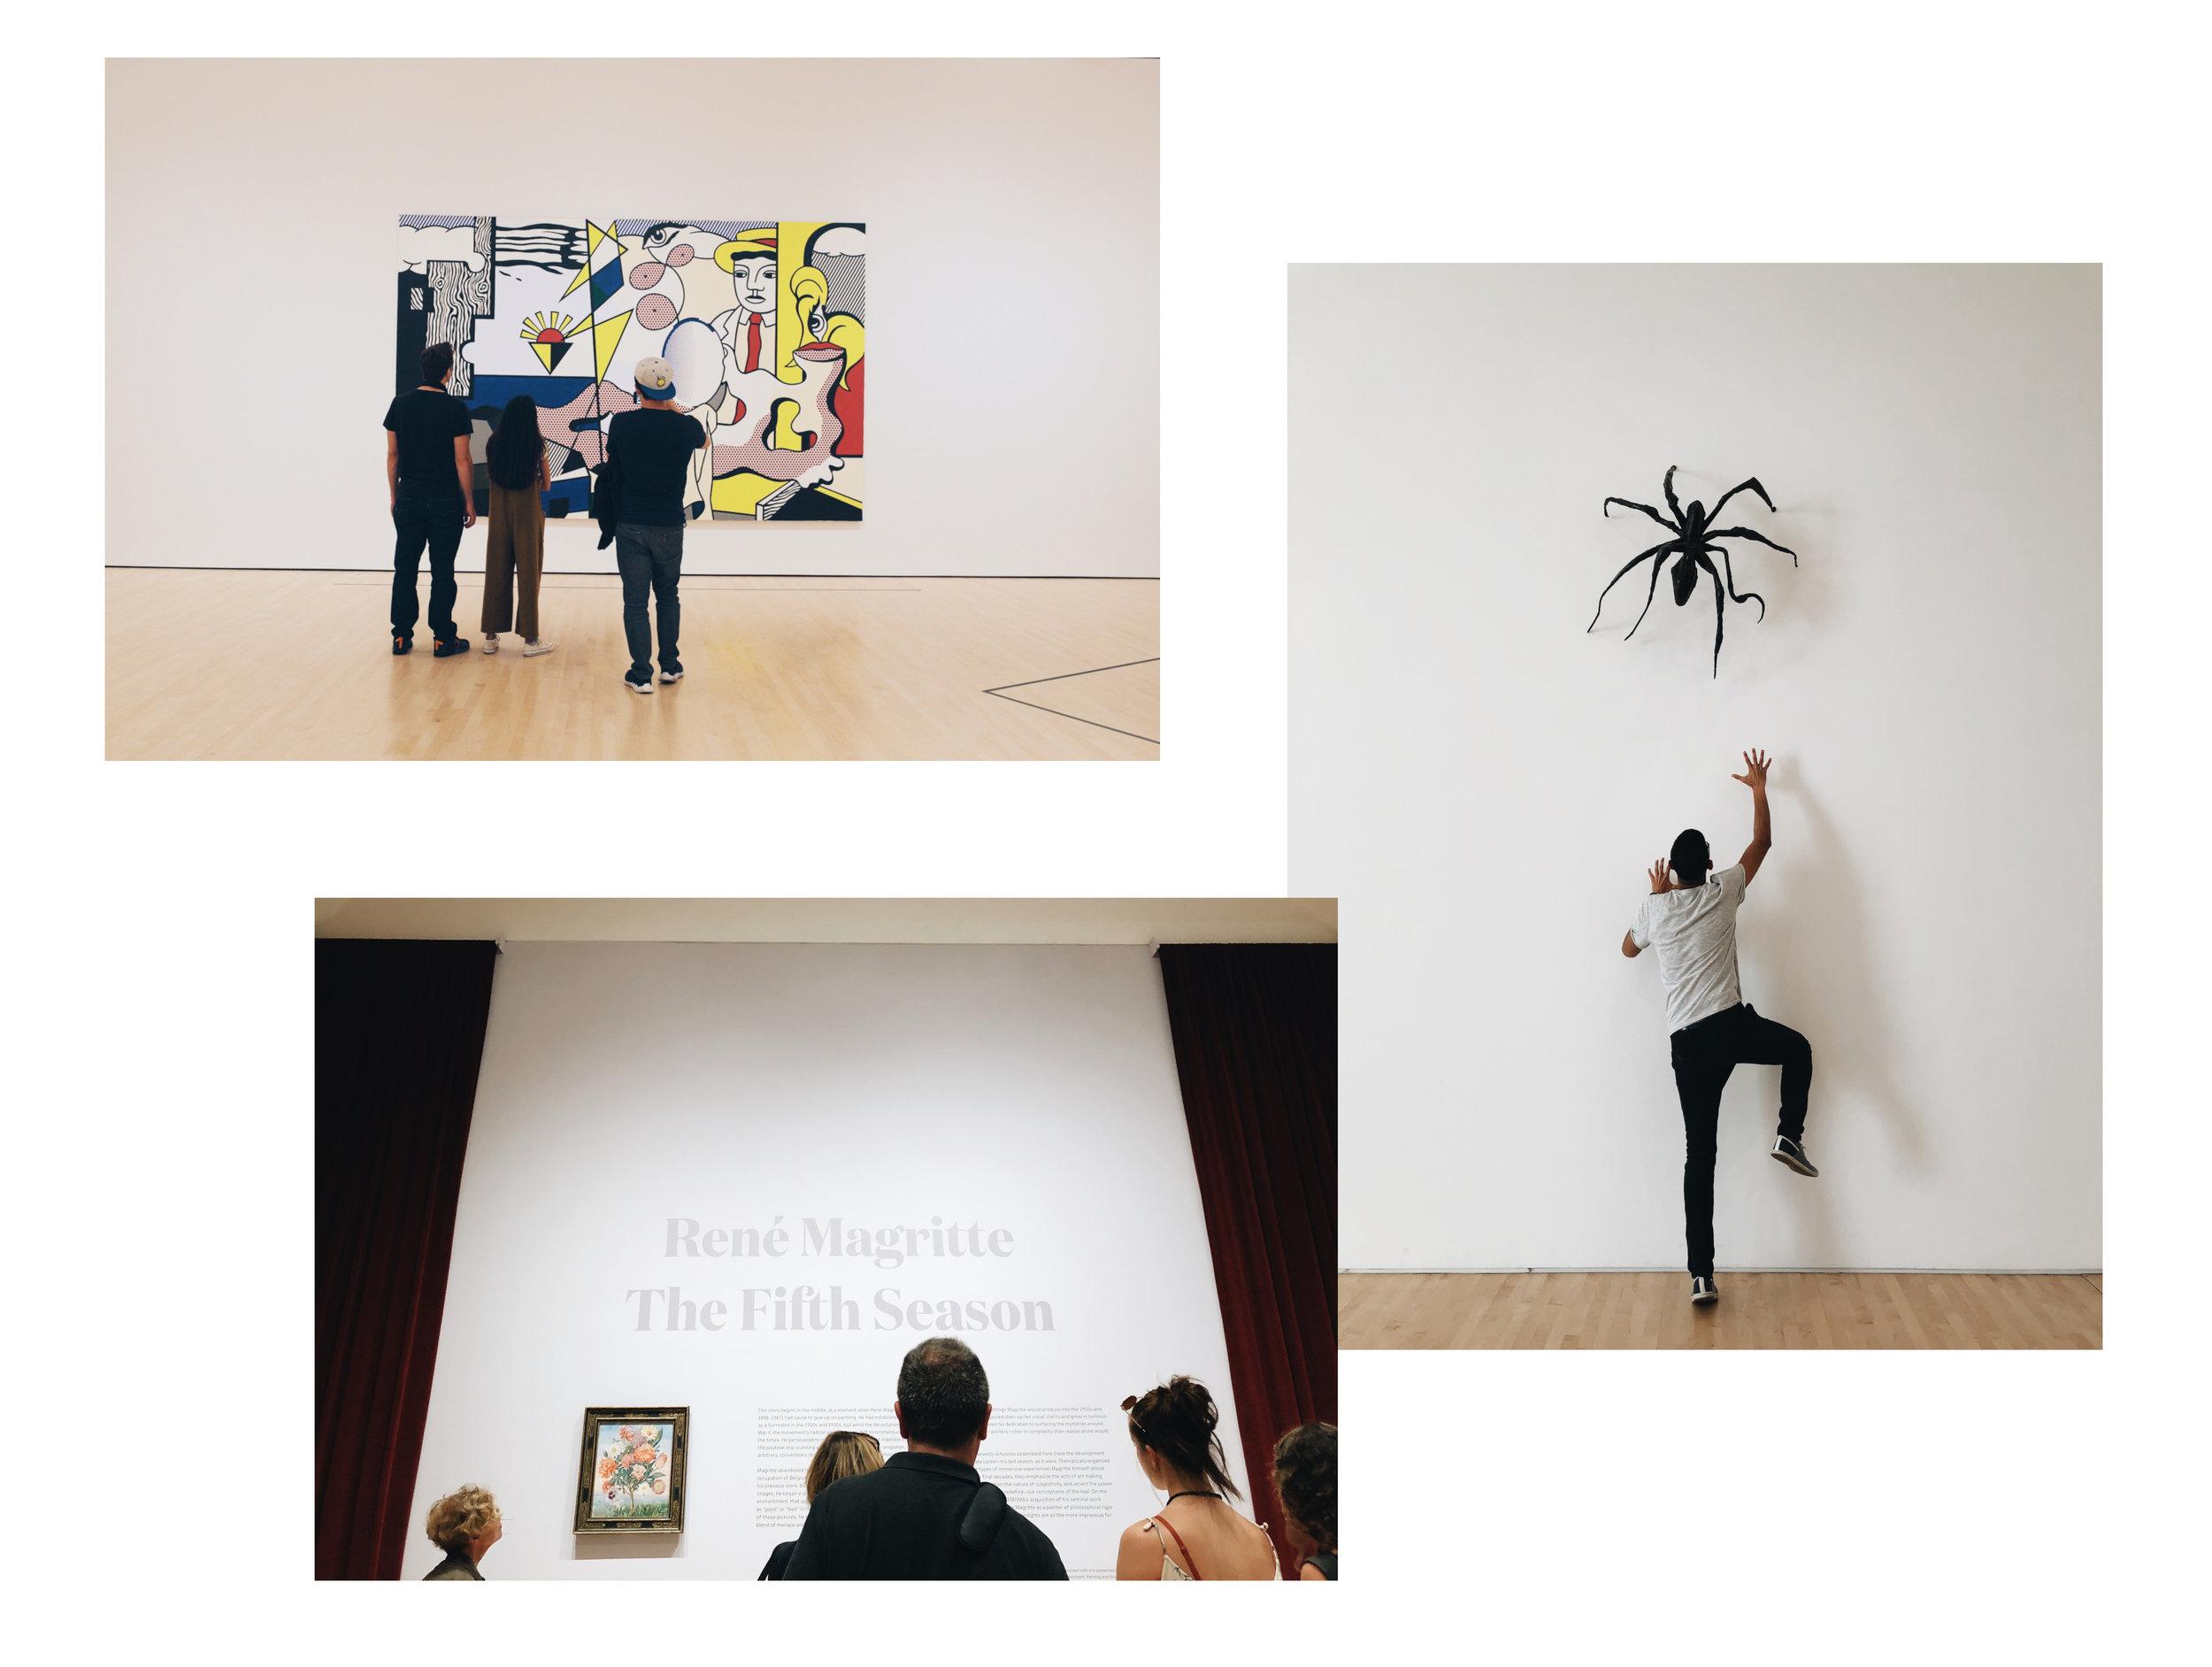 SFMOMA-magritte-exposition-san-francisco.JPG